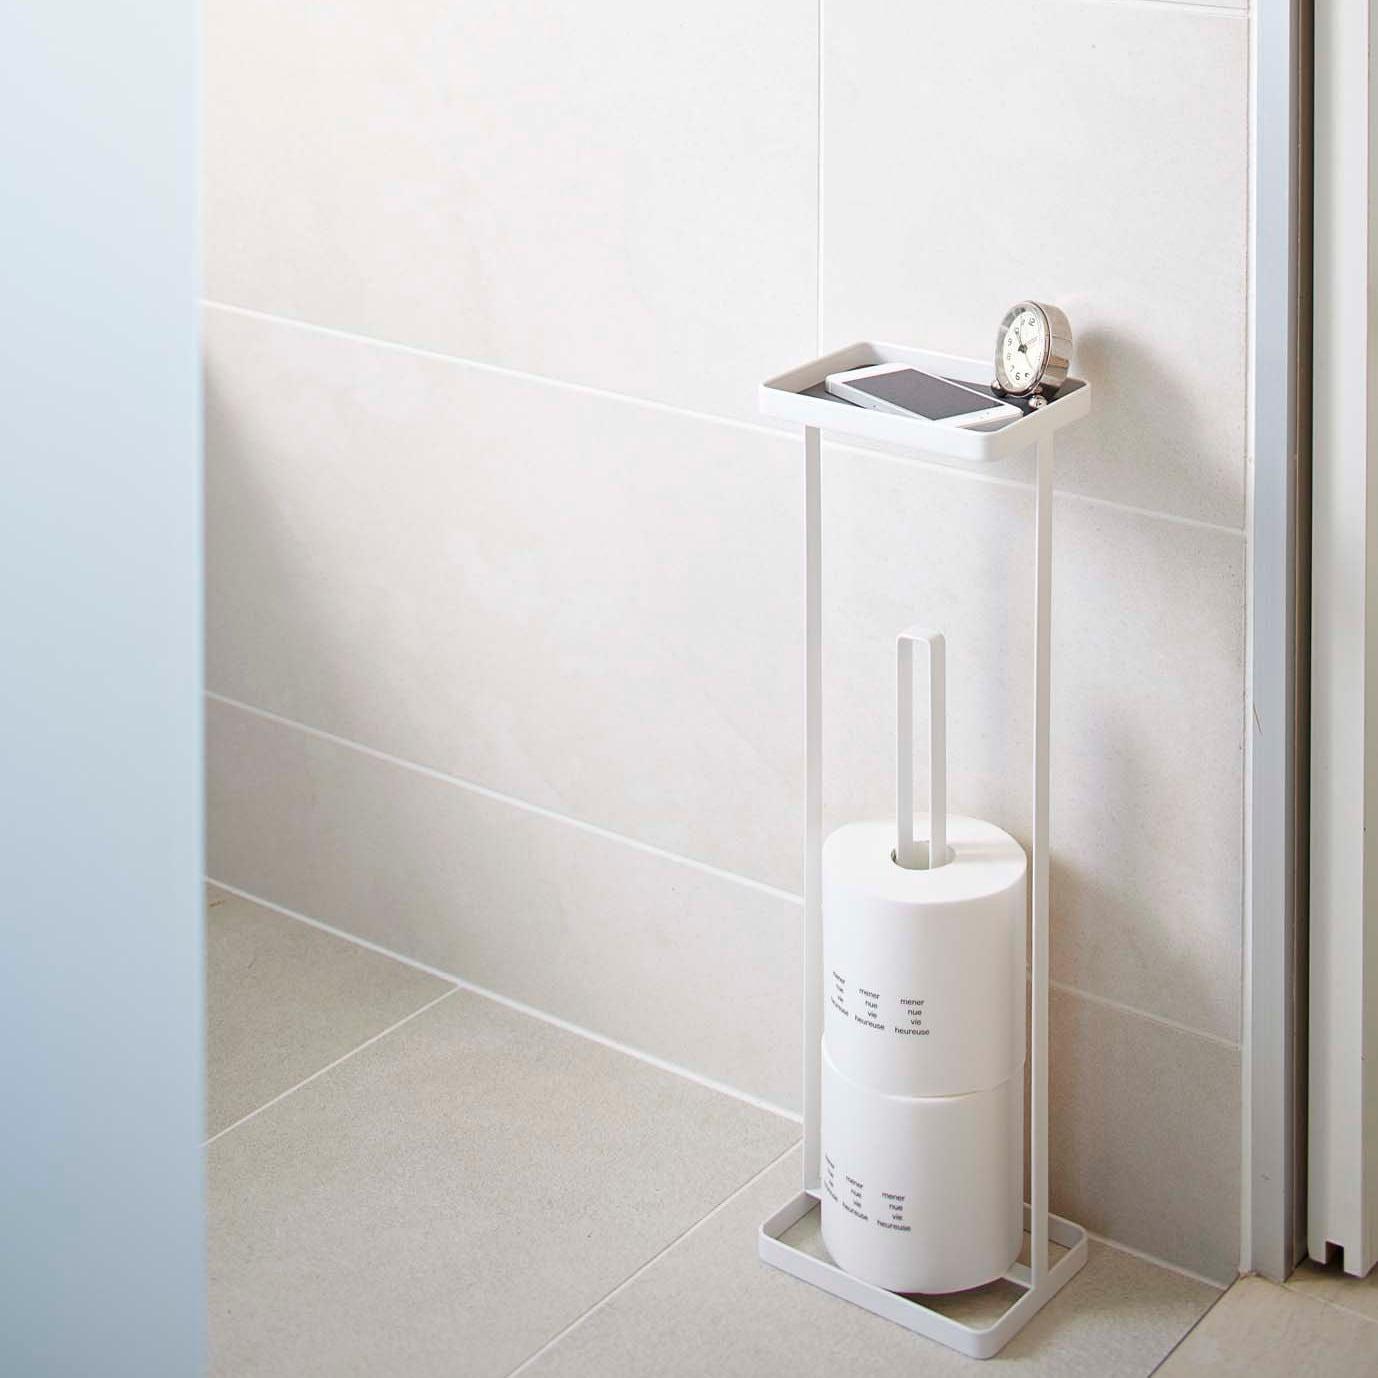 One Size Bathroom Storage Holder Stand Natural Yamazaki Home Rin Toilet Paper Dispenser